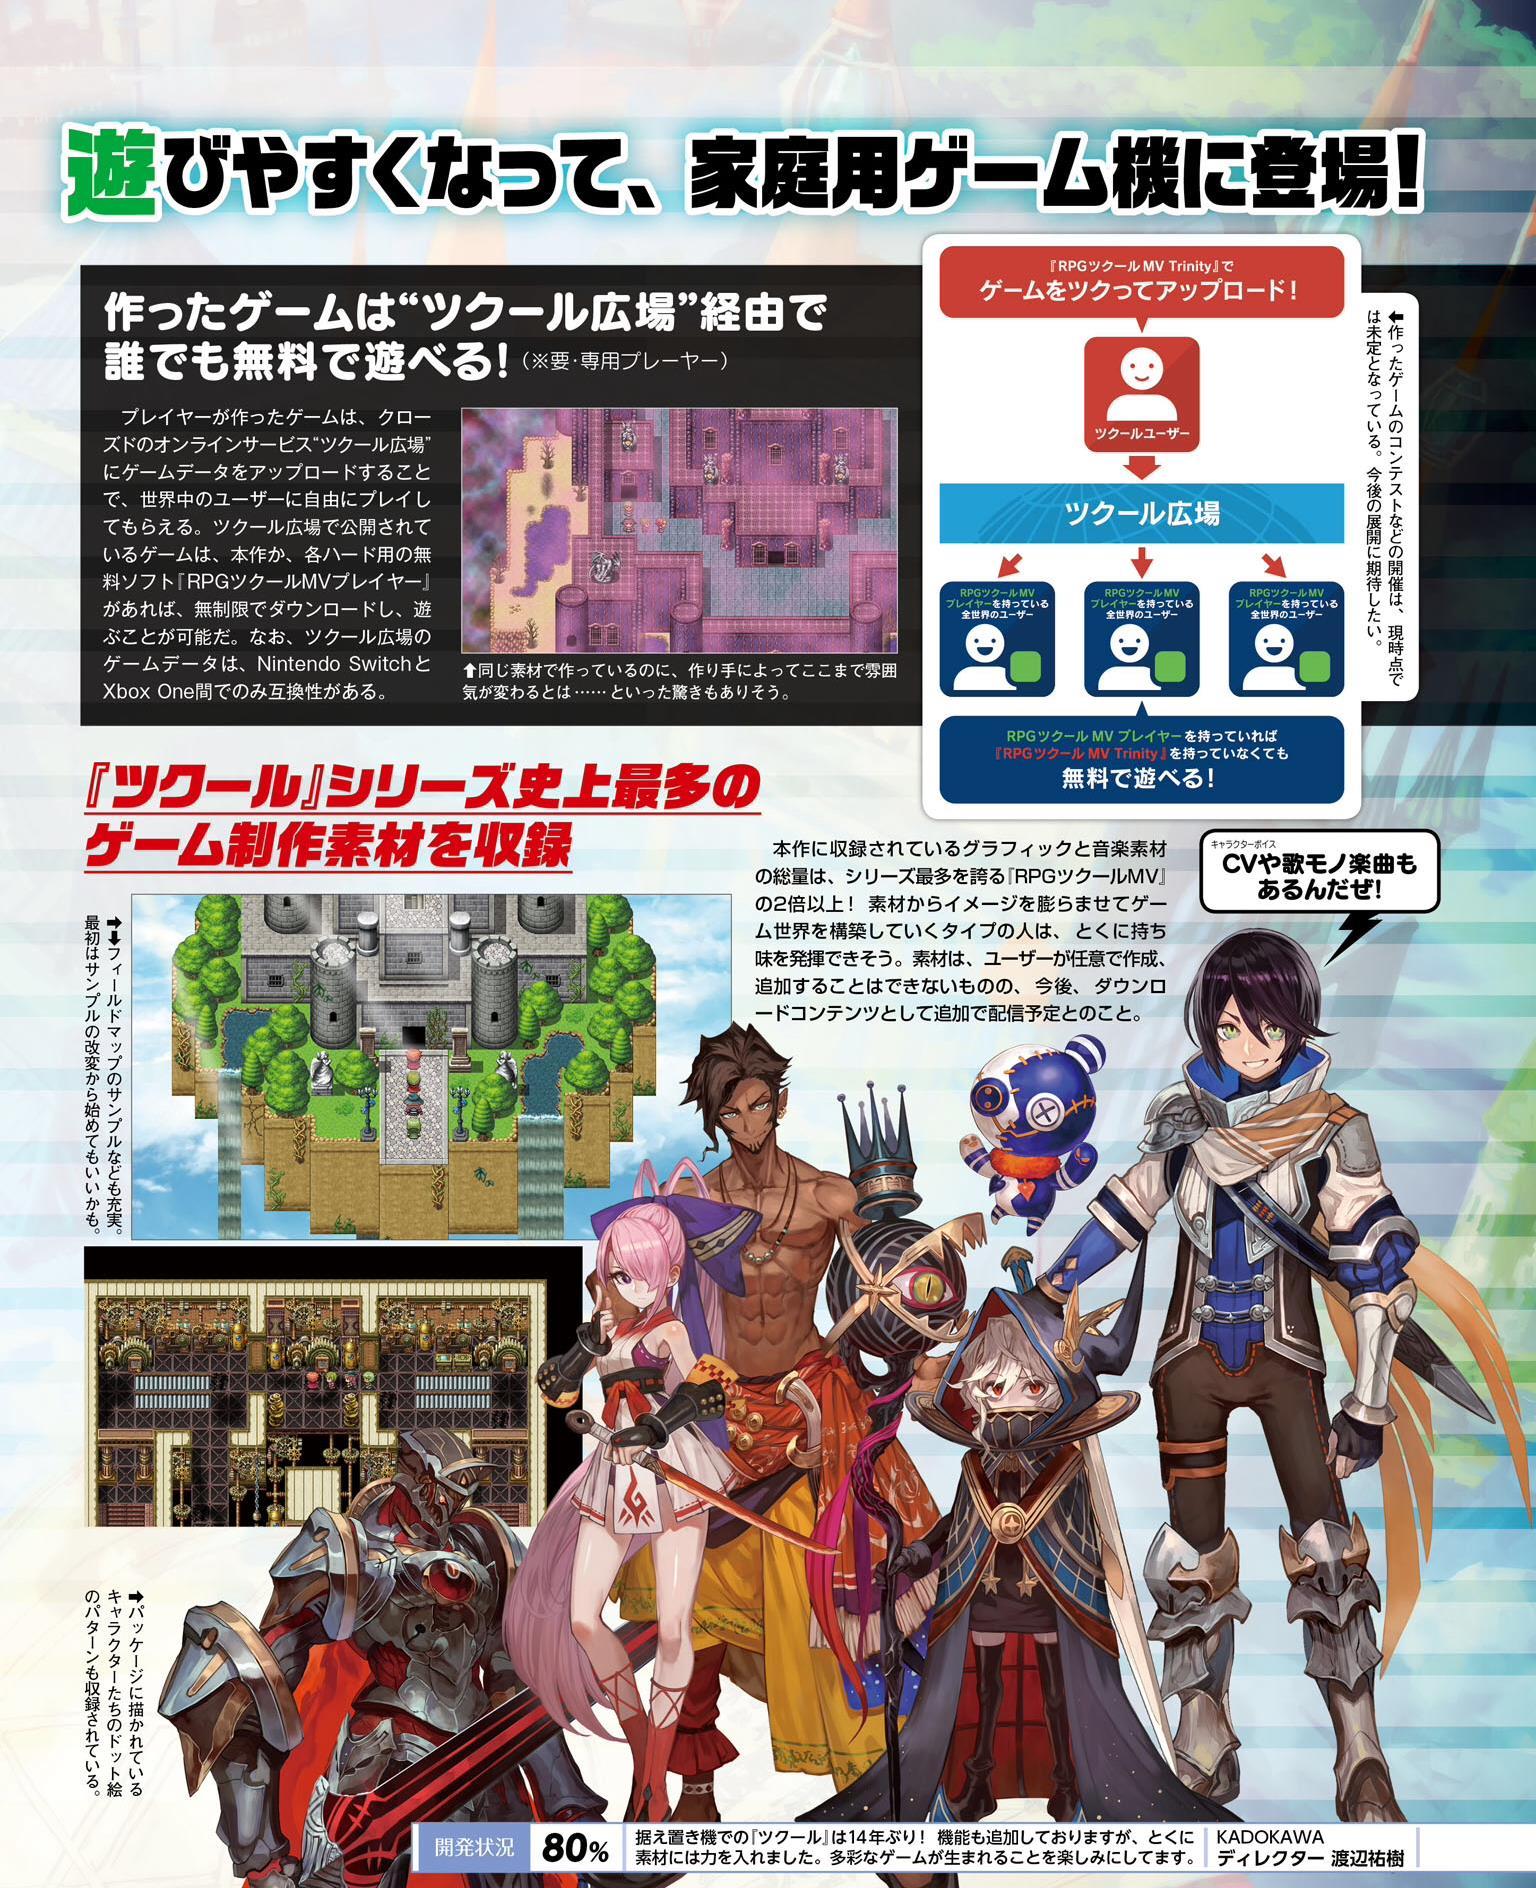 Scans roundup - RPG Maker MV, Cytus Alpha, Mega Man 11, The World